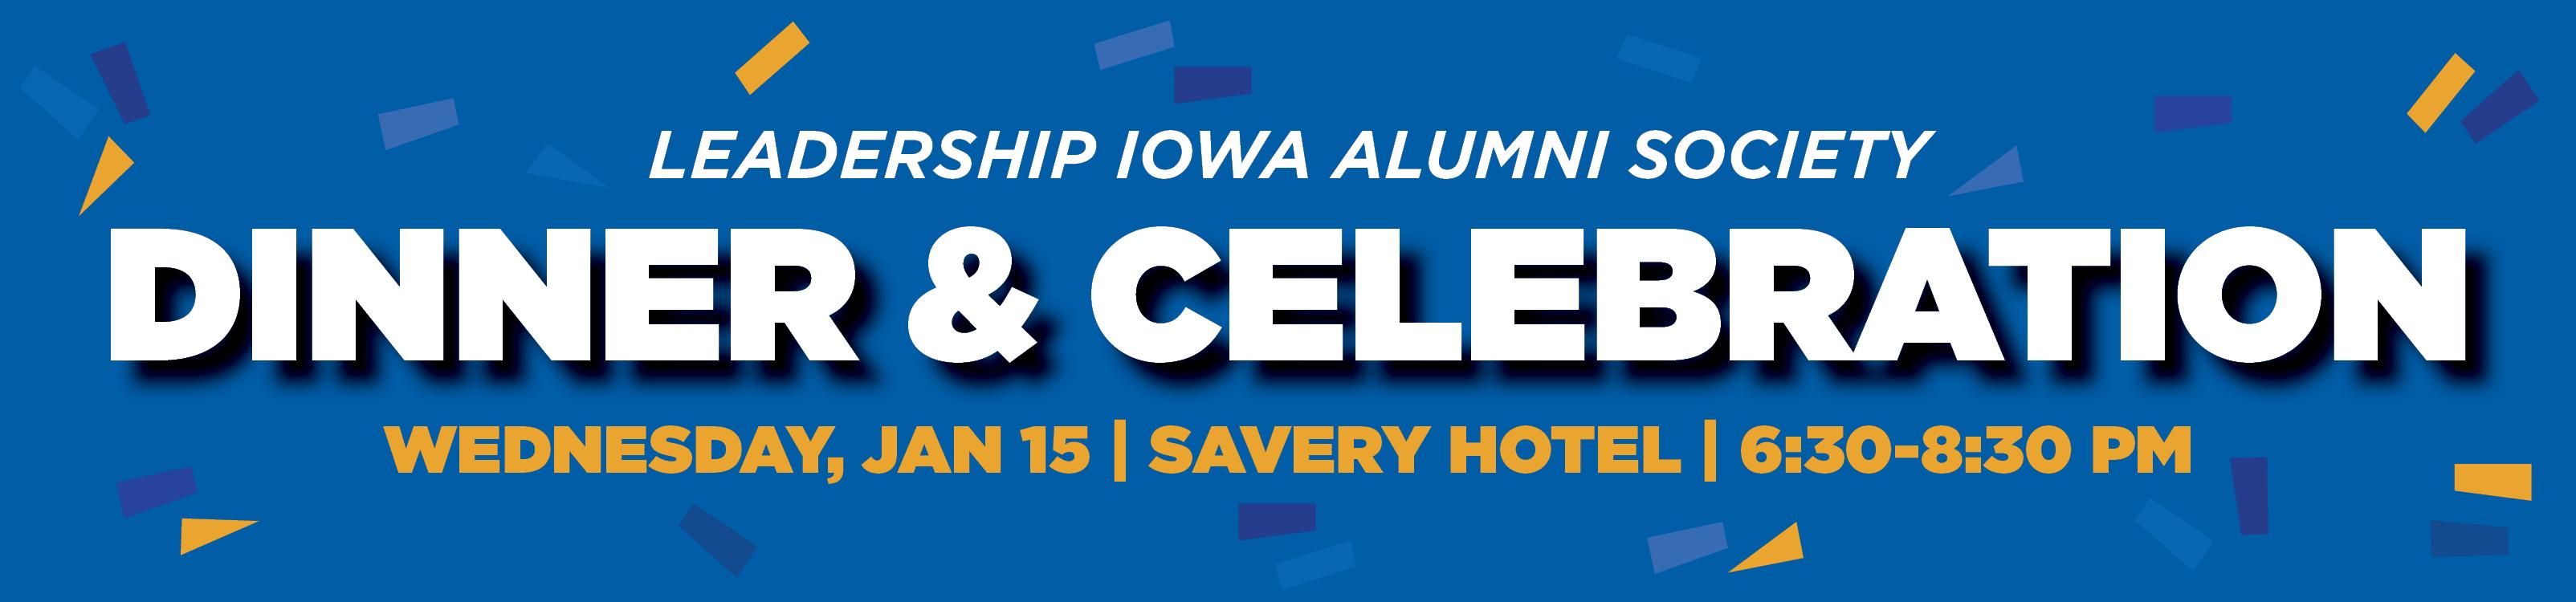 Leadership Iowa Alumni Society Dinner & Celebration